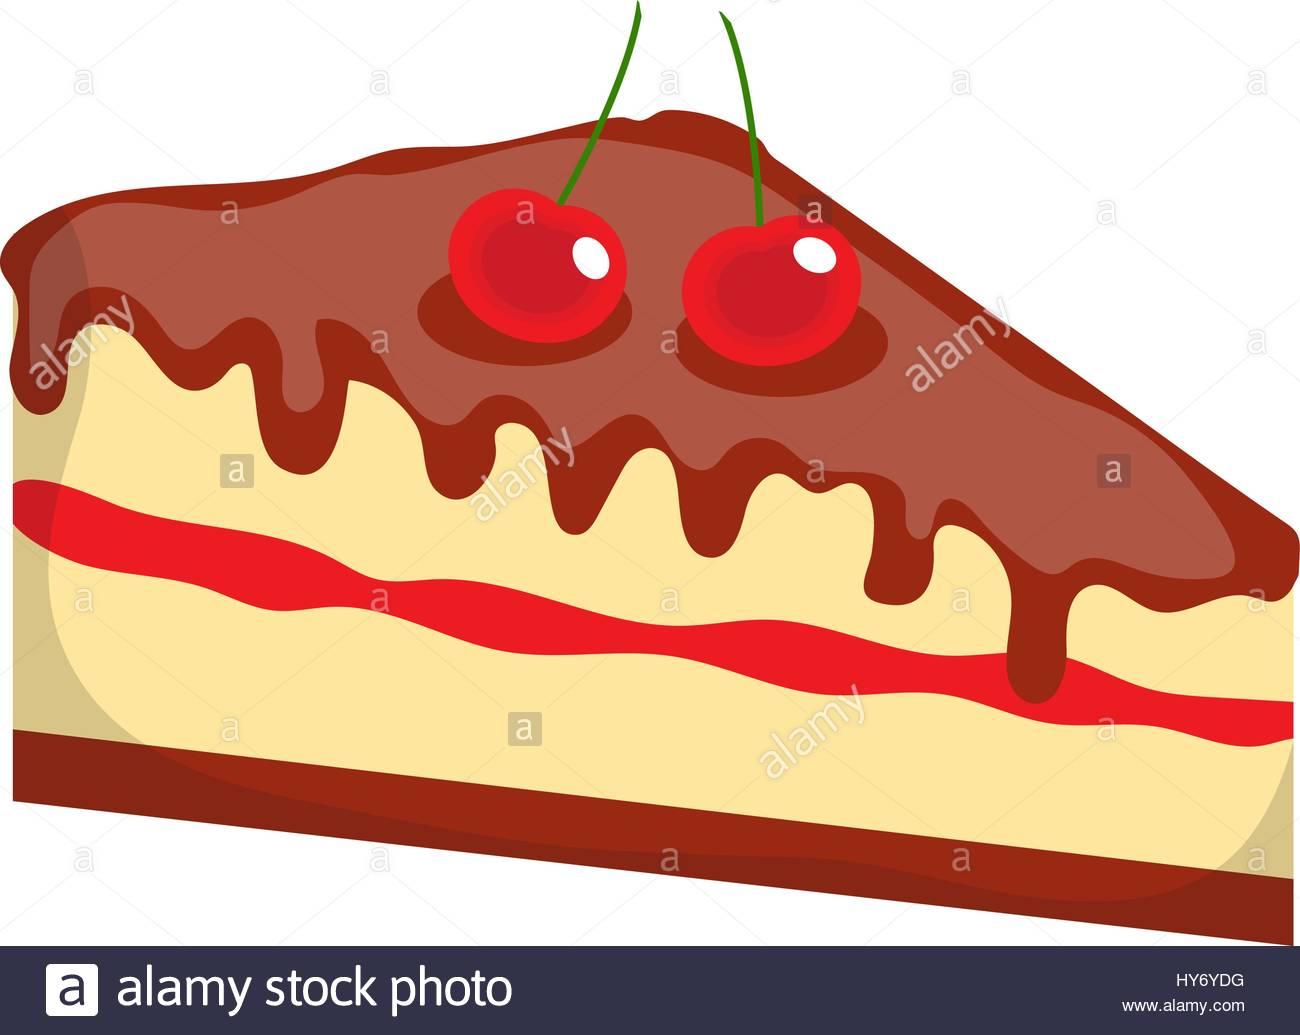 1300x1035 Cheesecake, Cake Icon, Flat, Cartoon Style.isolated On White Stock